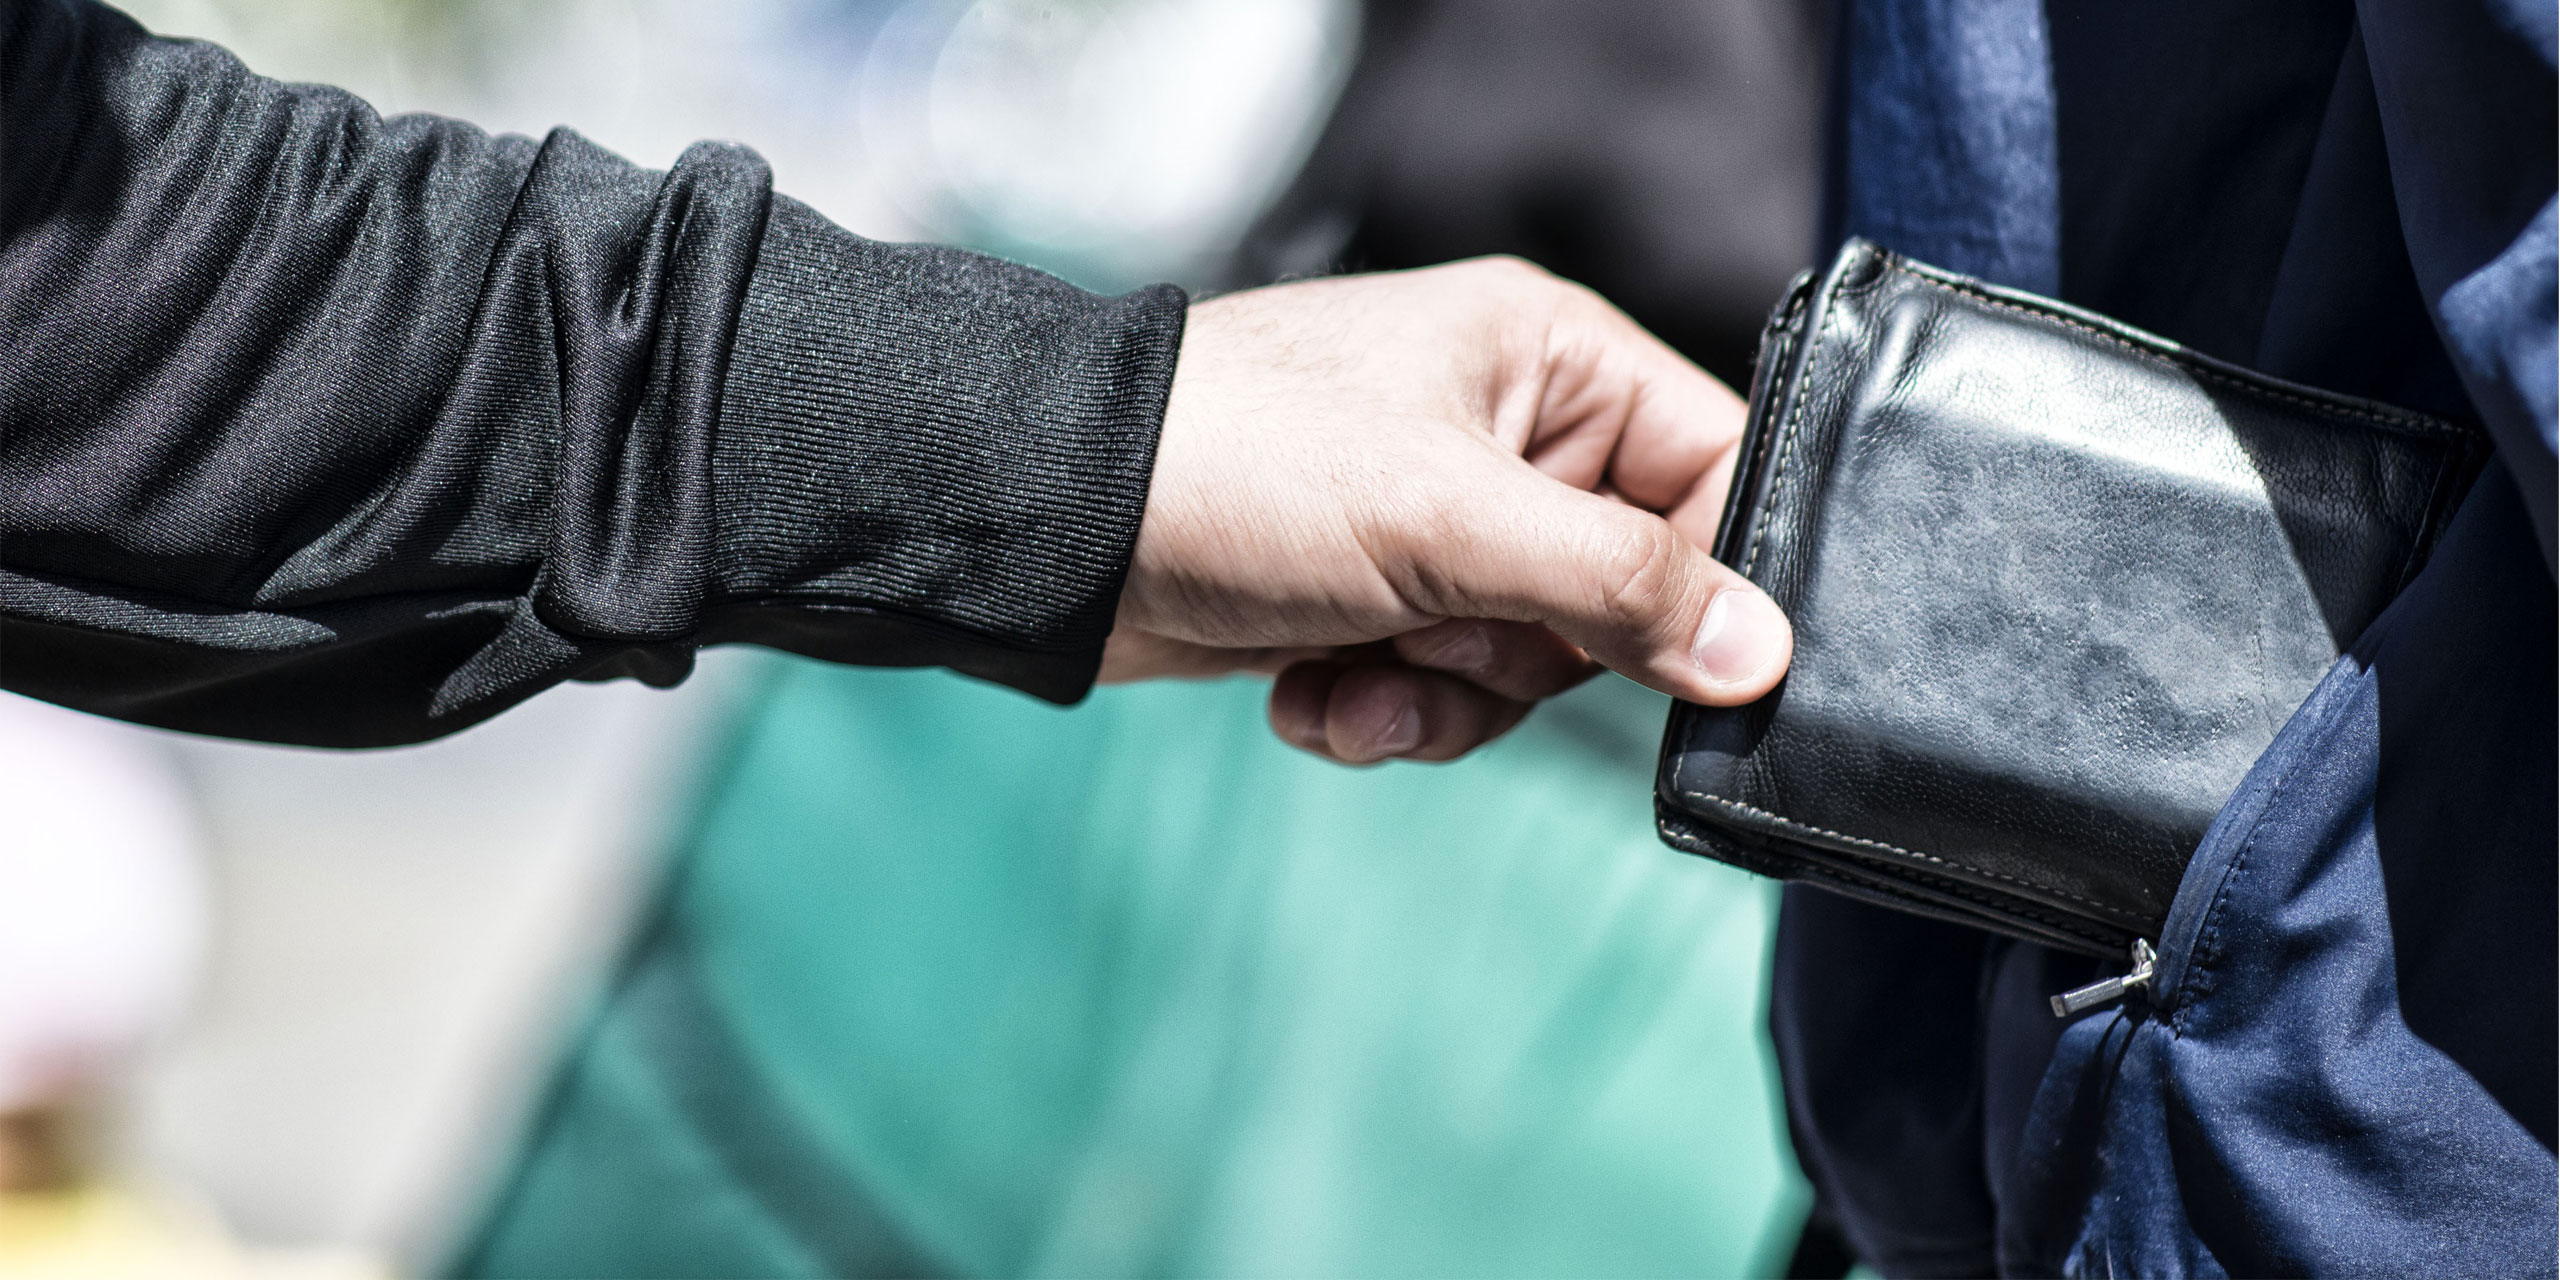 Thieve pickpocketing wallet; Courtesy of DDekk/Shutterstock.com